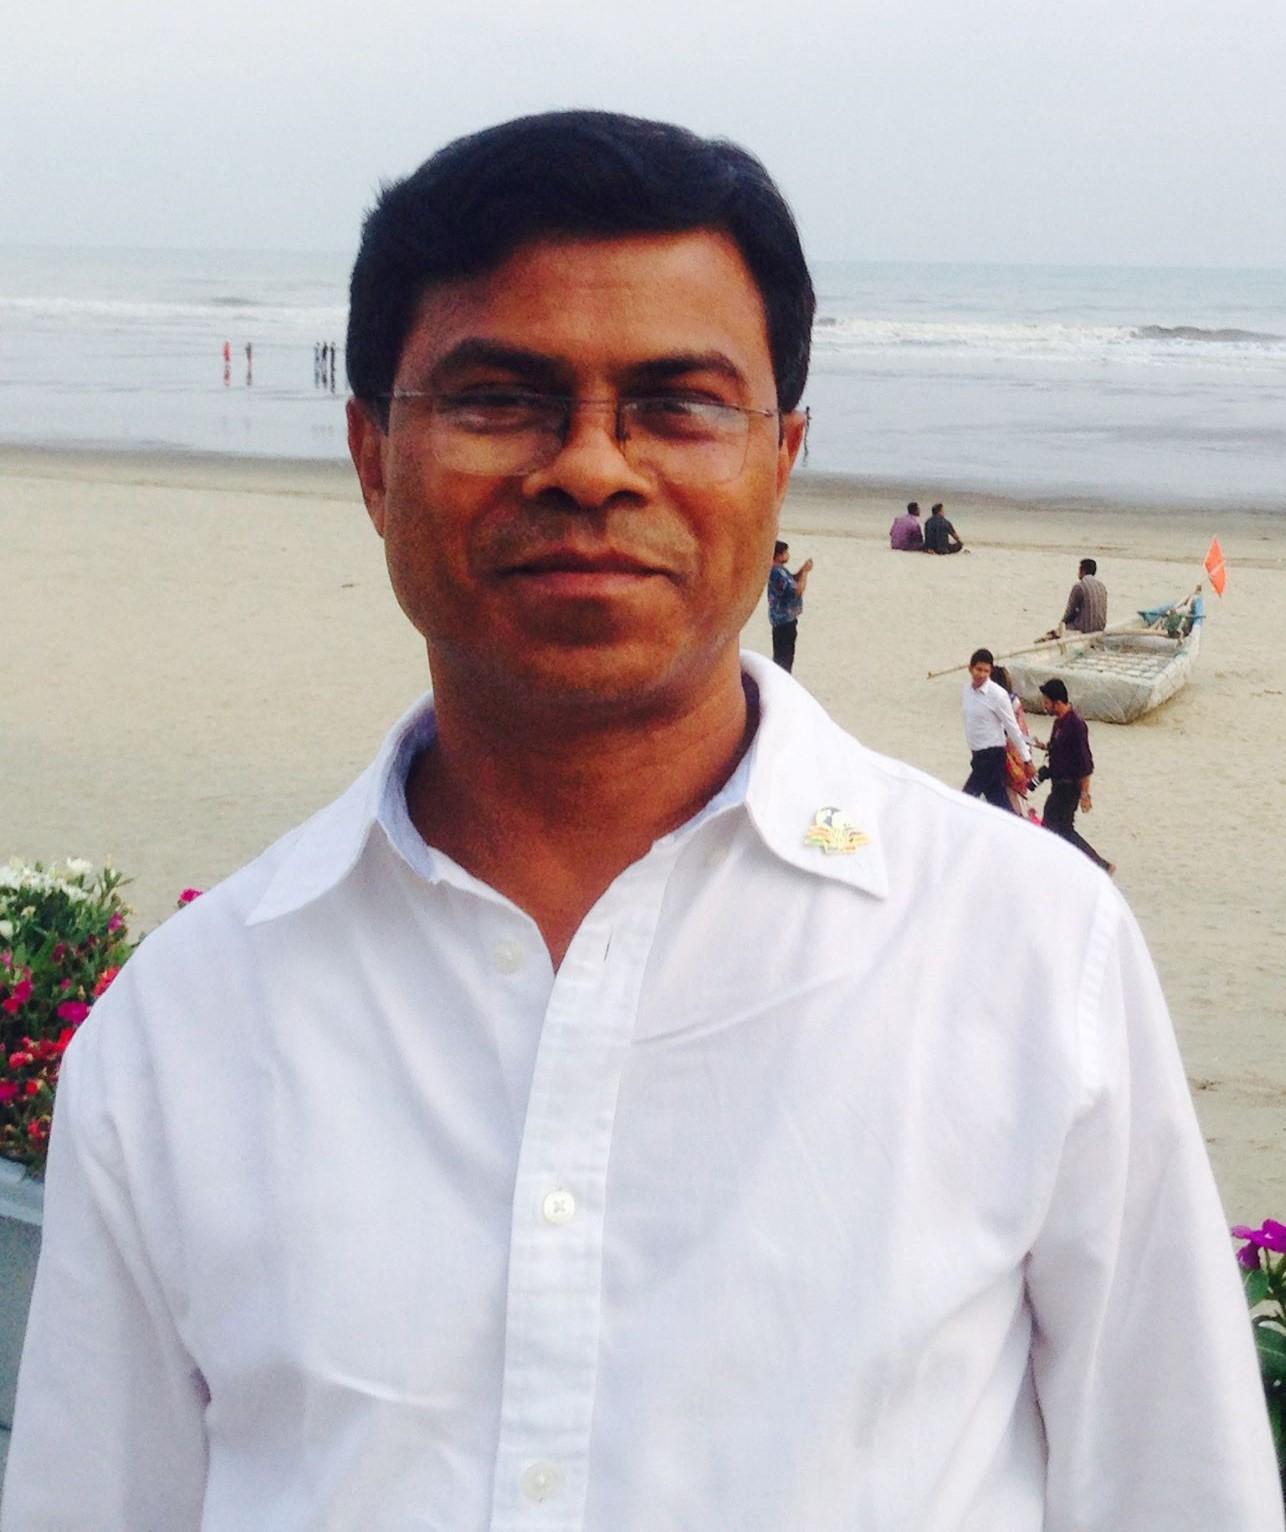 Md Motaher Hossain